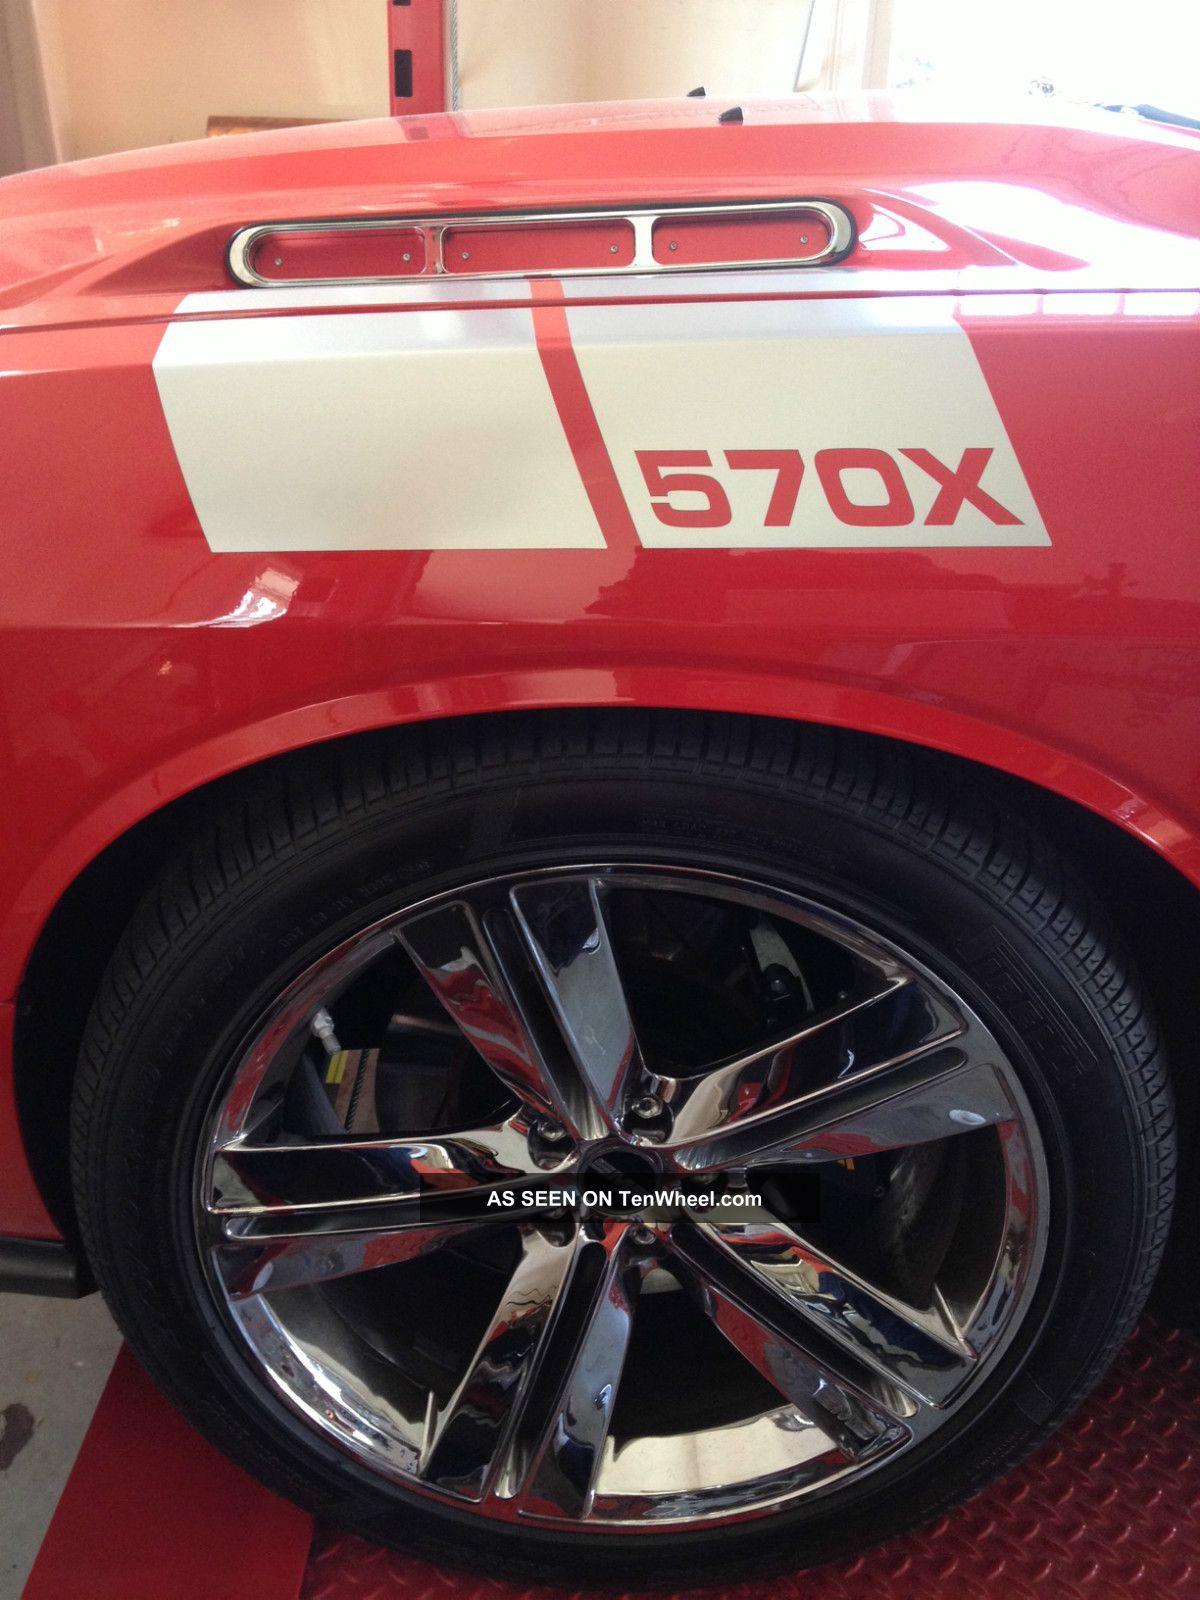 - 2009 Dodge Challenger R / T Sms / Saleen 570x - Supercharged - 700+ Hp - Challenger photo